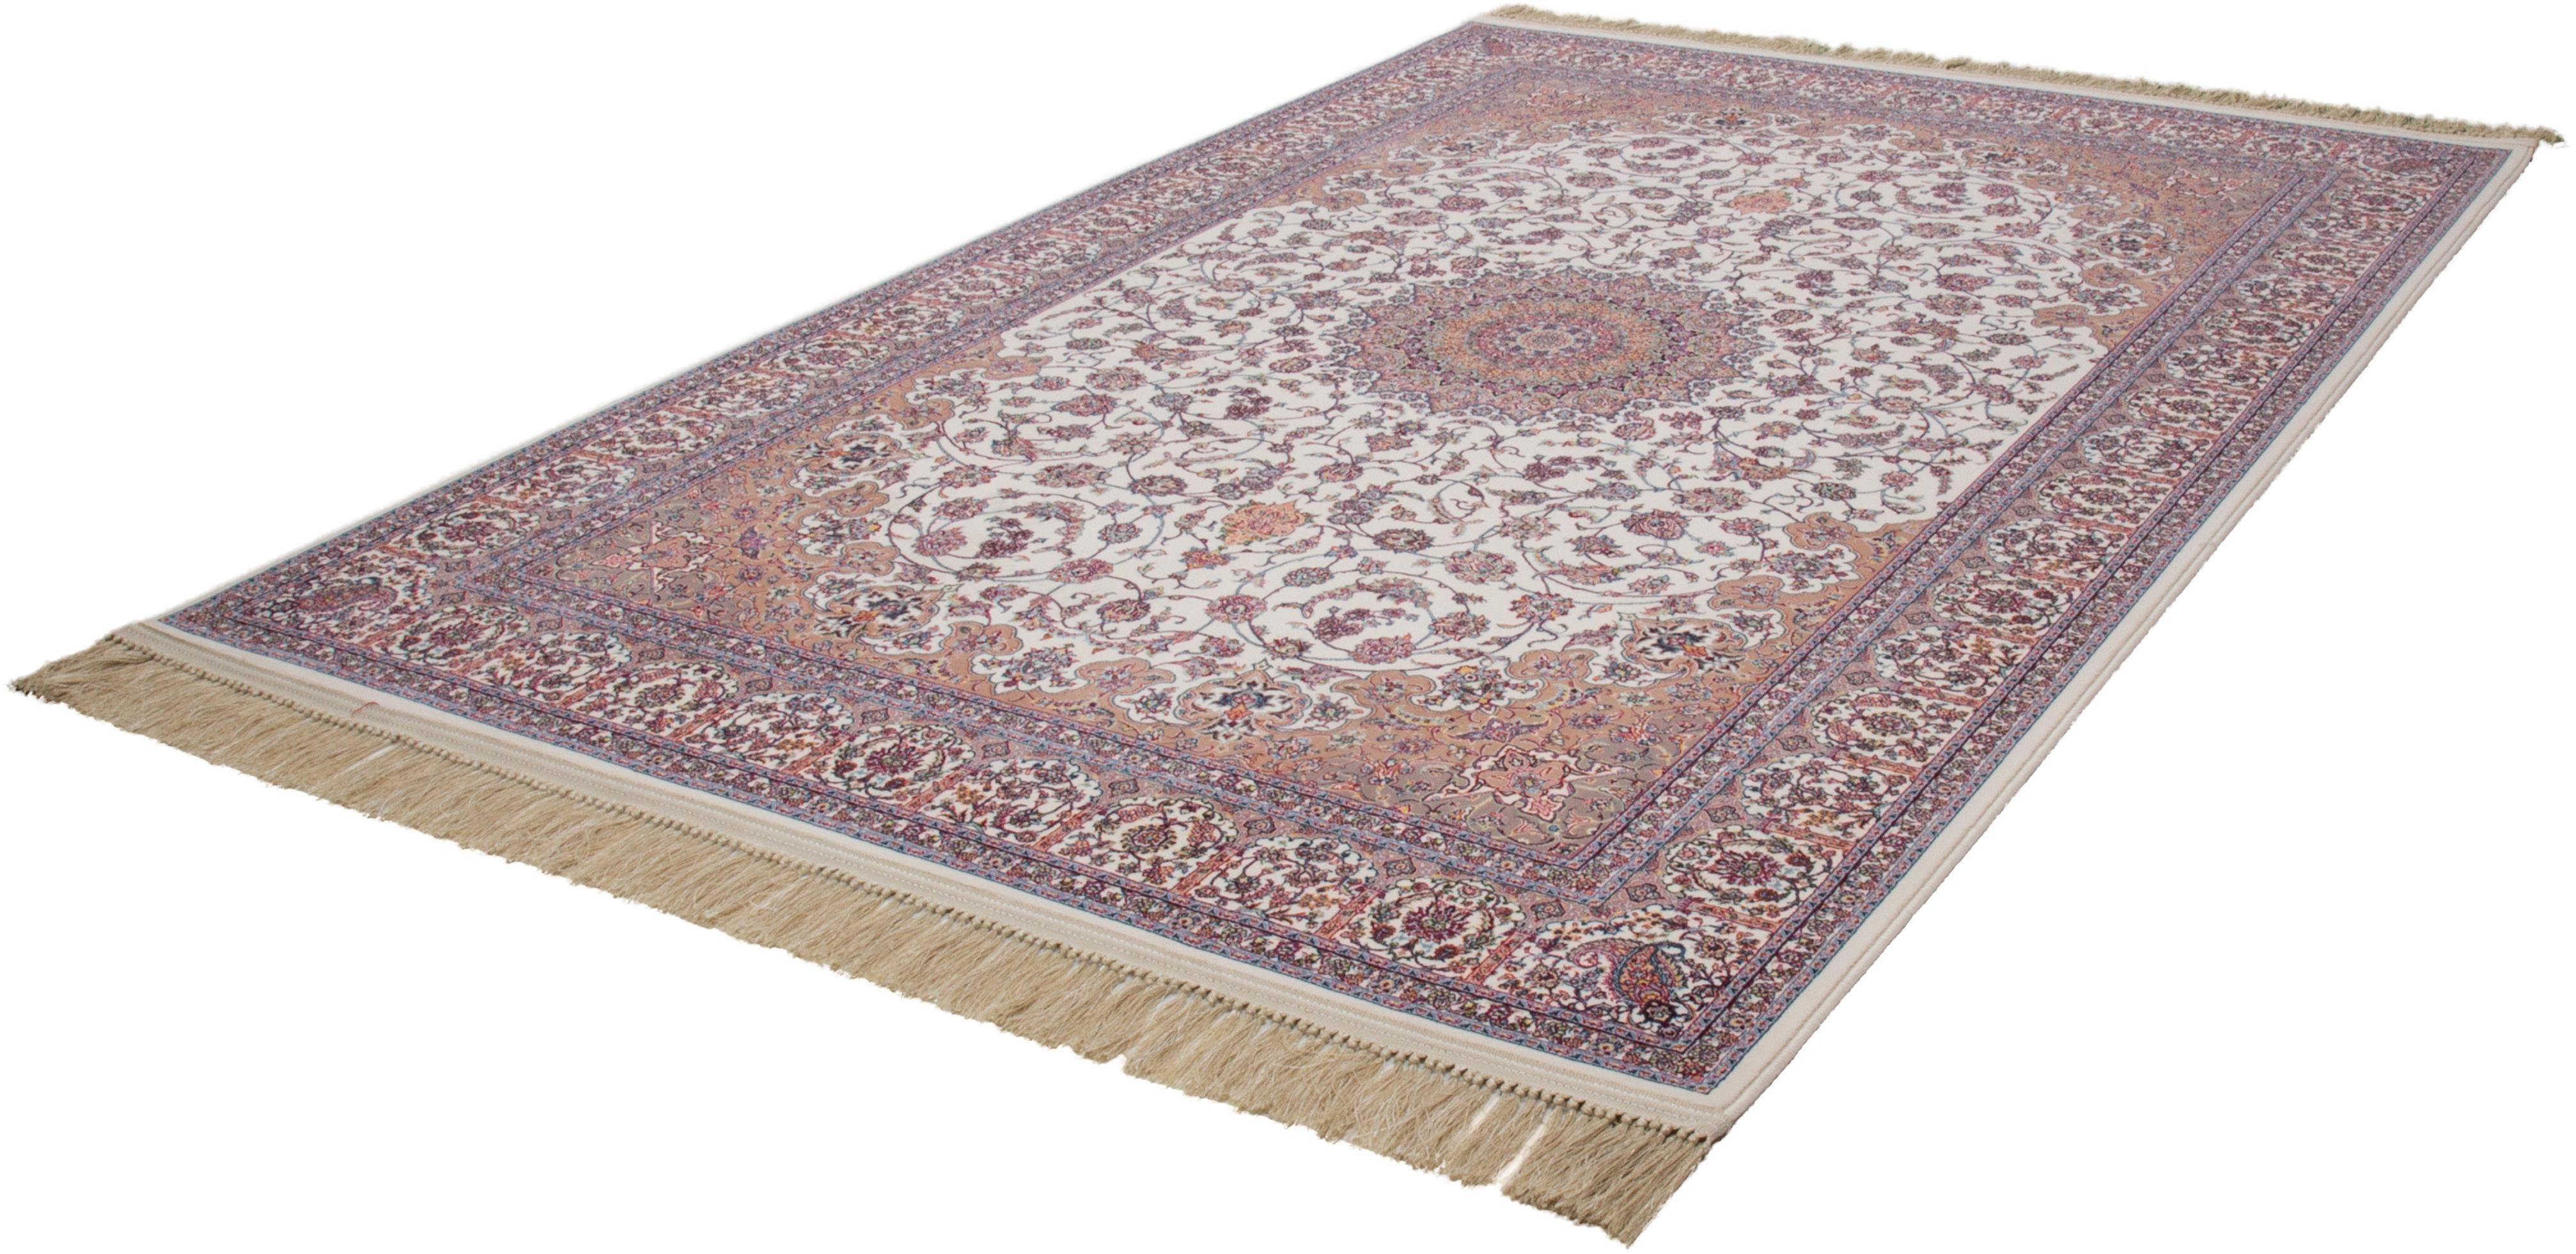 Orientteppich »Isfahan 900«, LALEE, rechteckig, Höhe 10 mm | Heimtextilien > Teppiche > Orientteppiche | LALEE